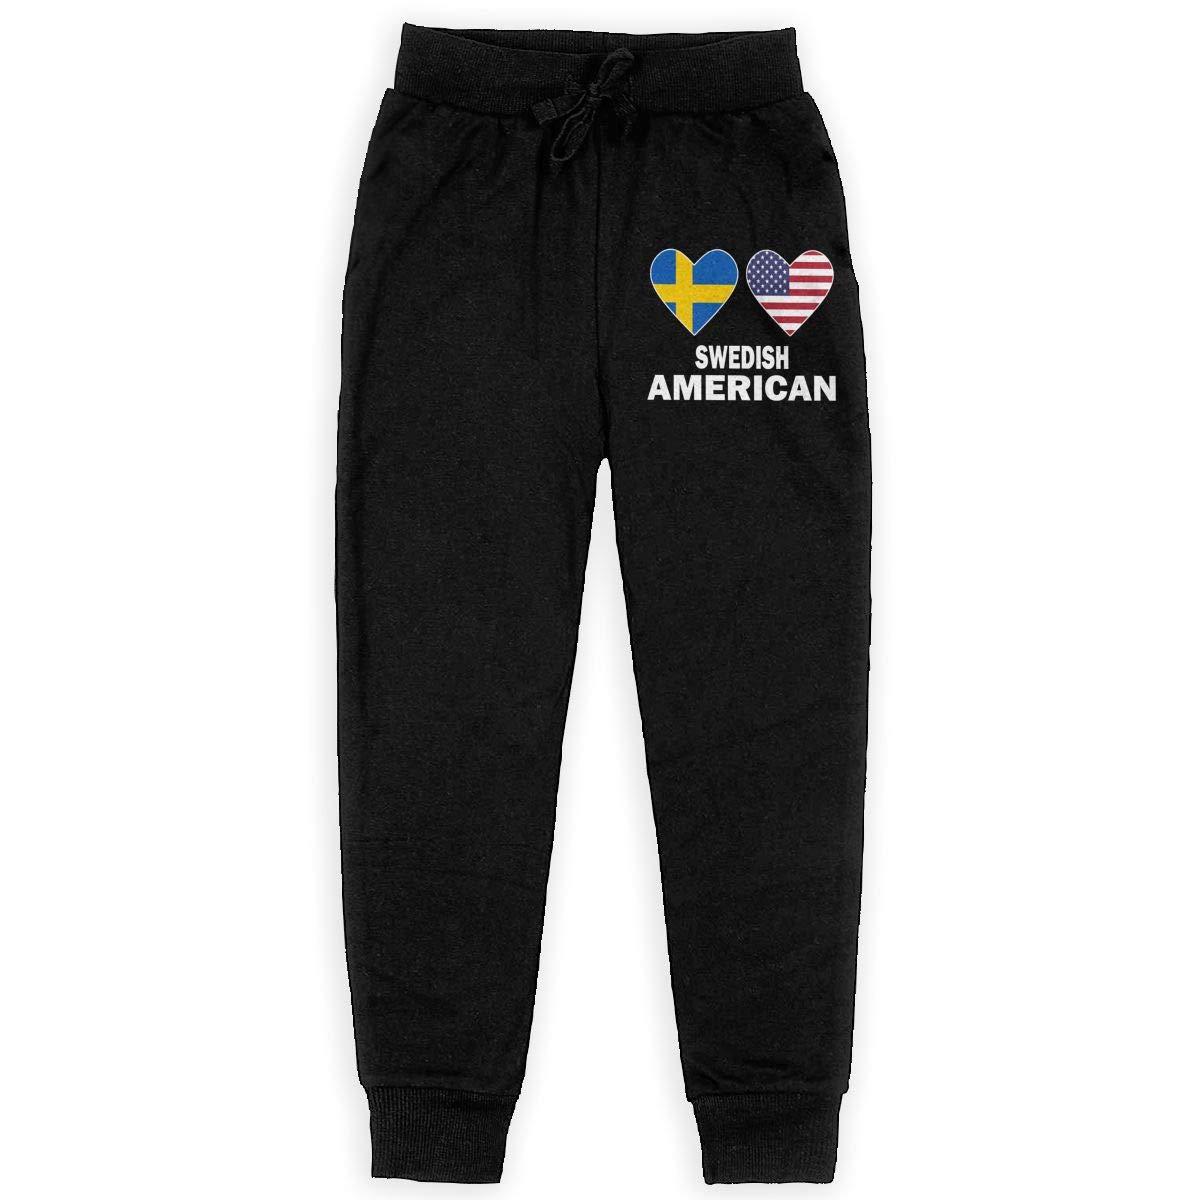 WYZVK22 Swedish American Hearts Soft//Cozy Sweatpants Boys Fleece Pants Teenager Boys